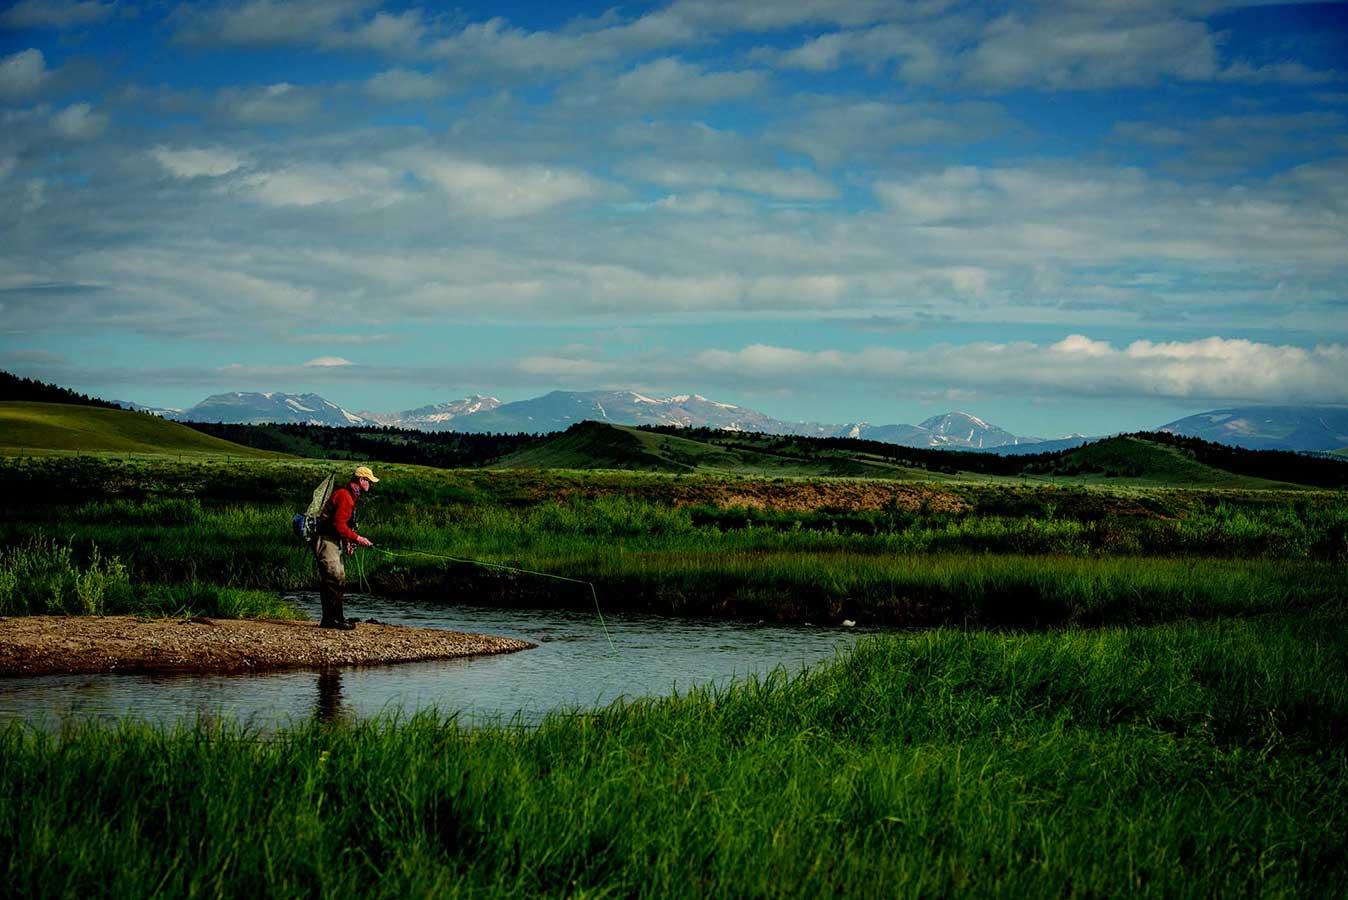 Fly Fishing Colorado's South Platte River Pat Dorsey